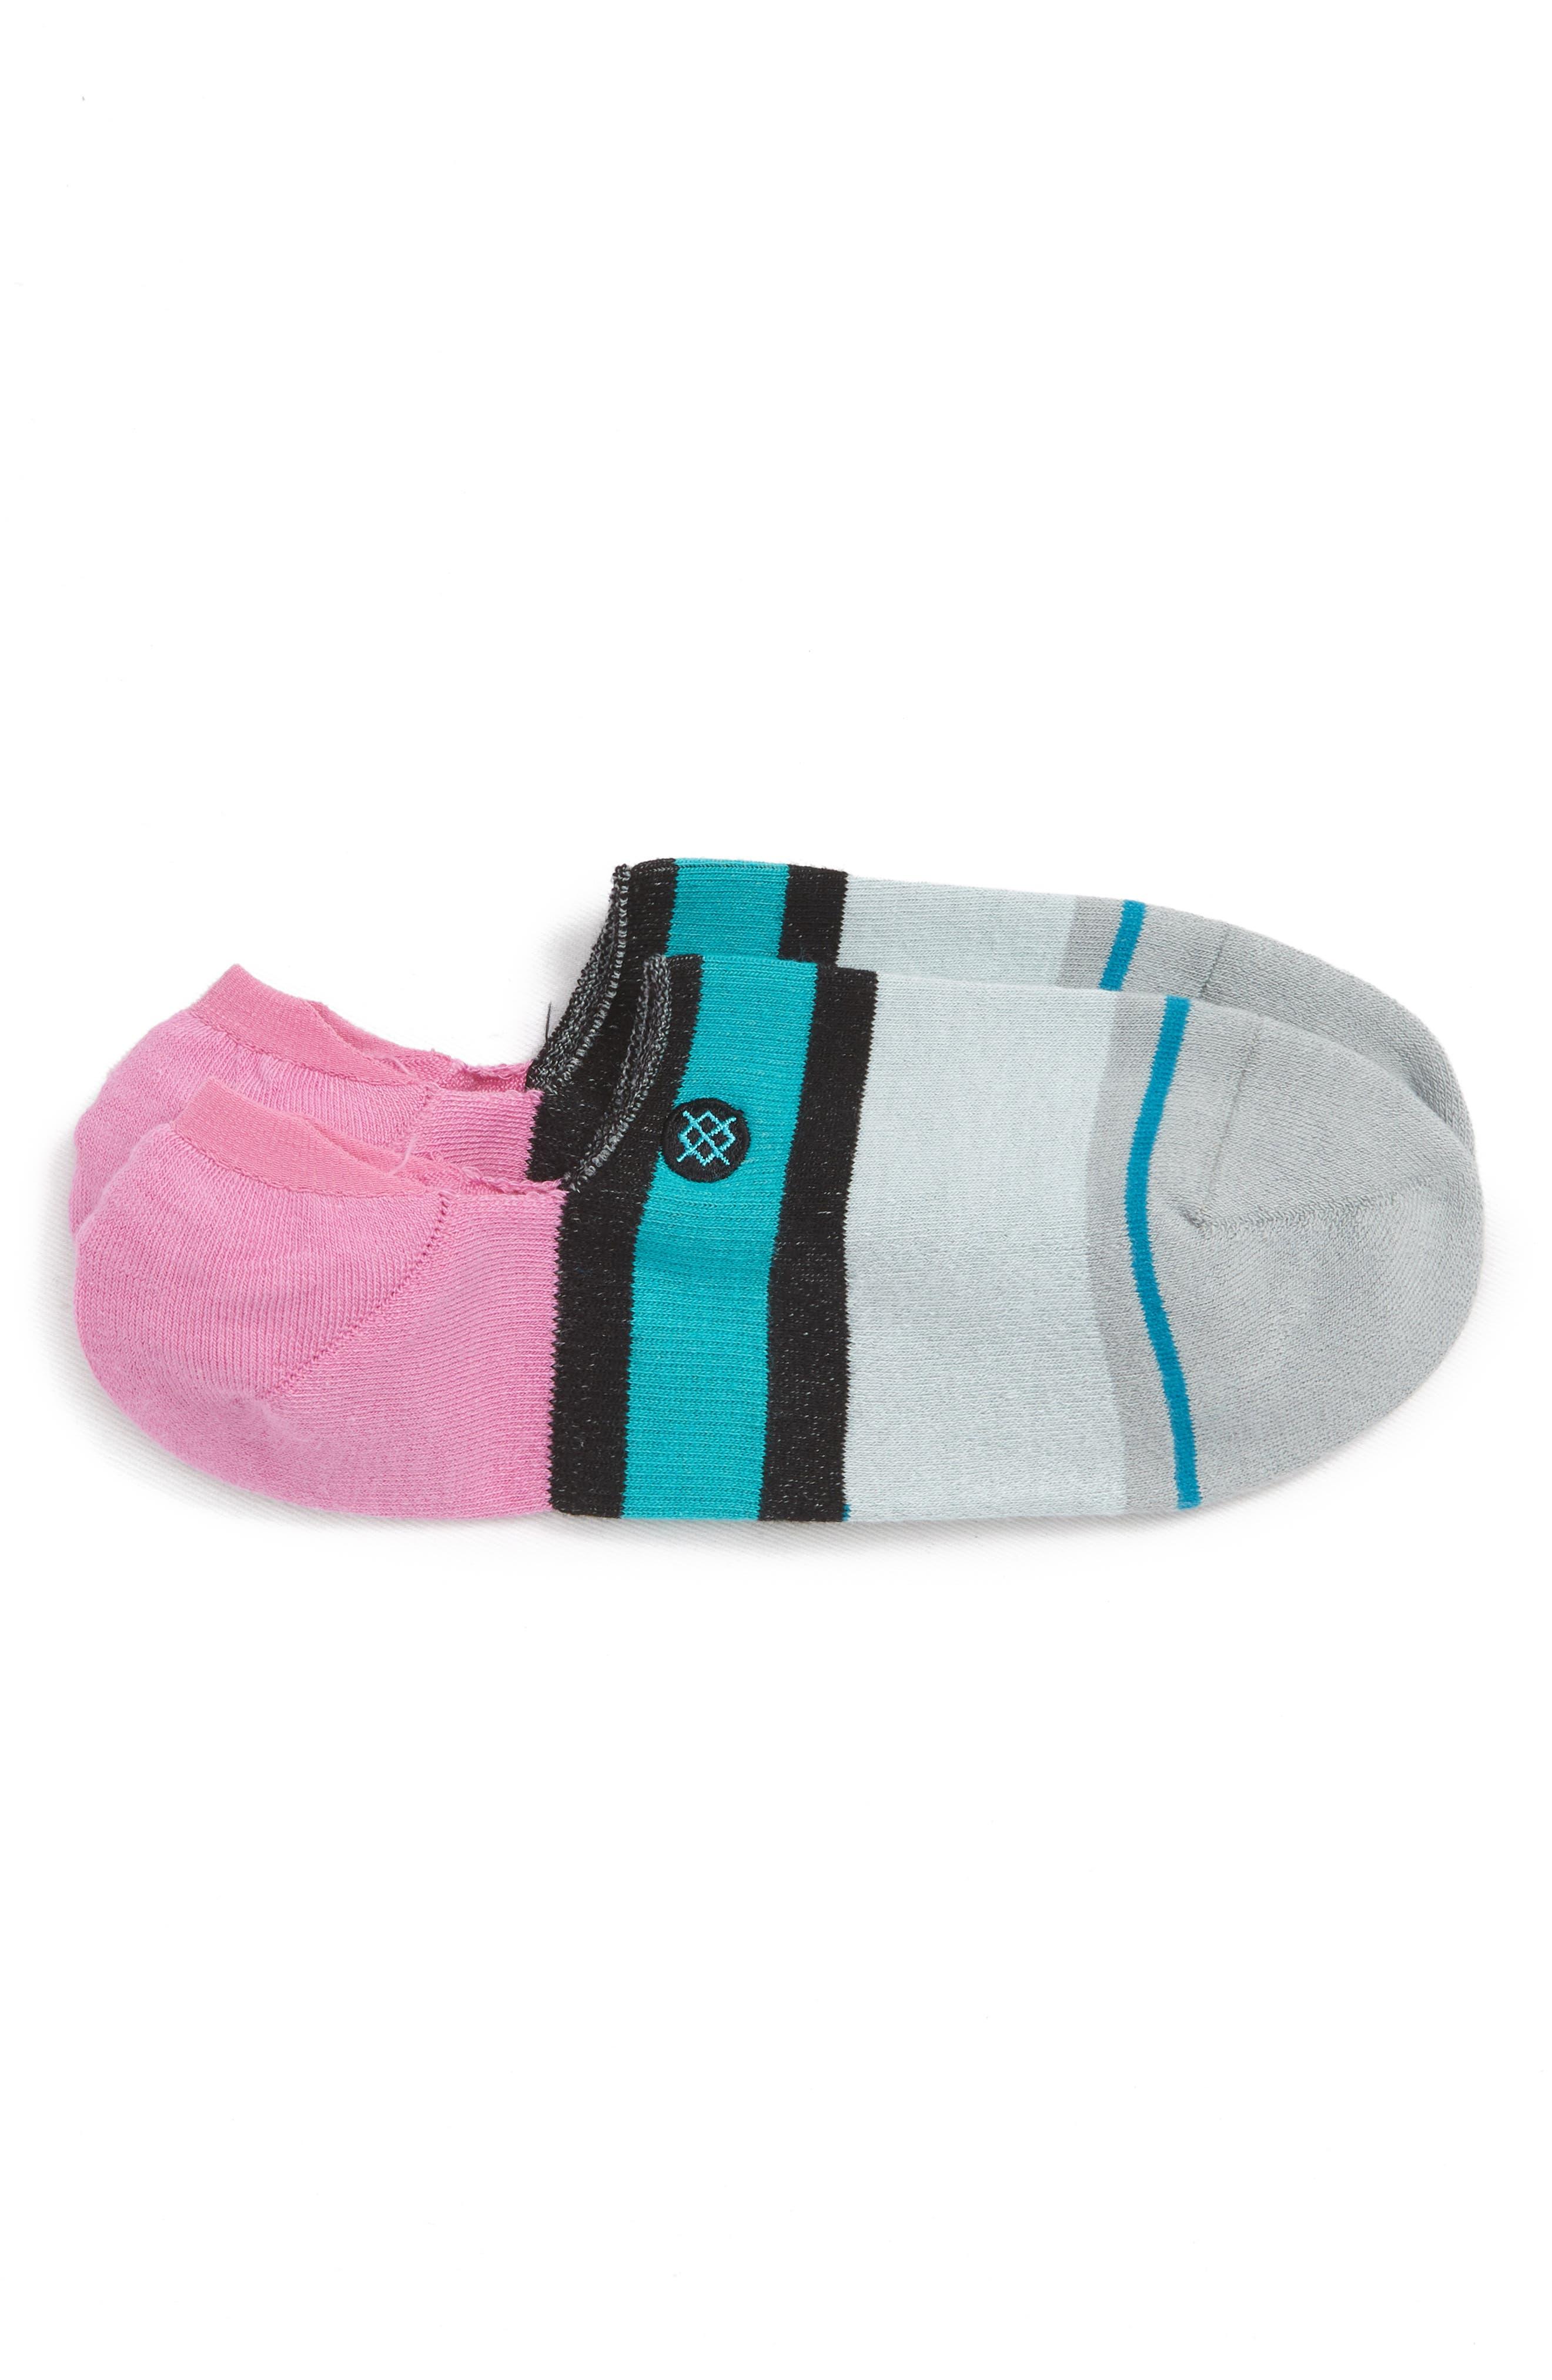 Abbot No-Show Socks,                         Main,                         color, Black